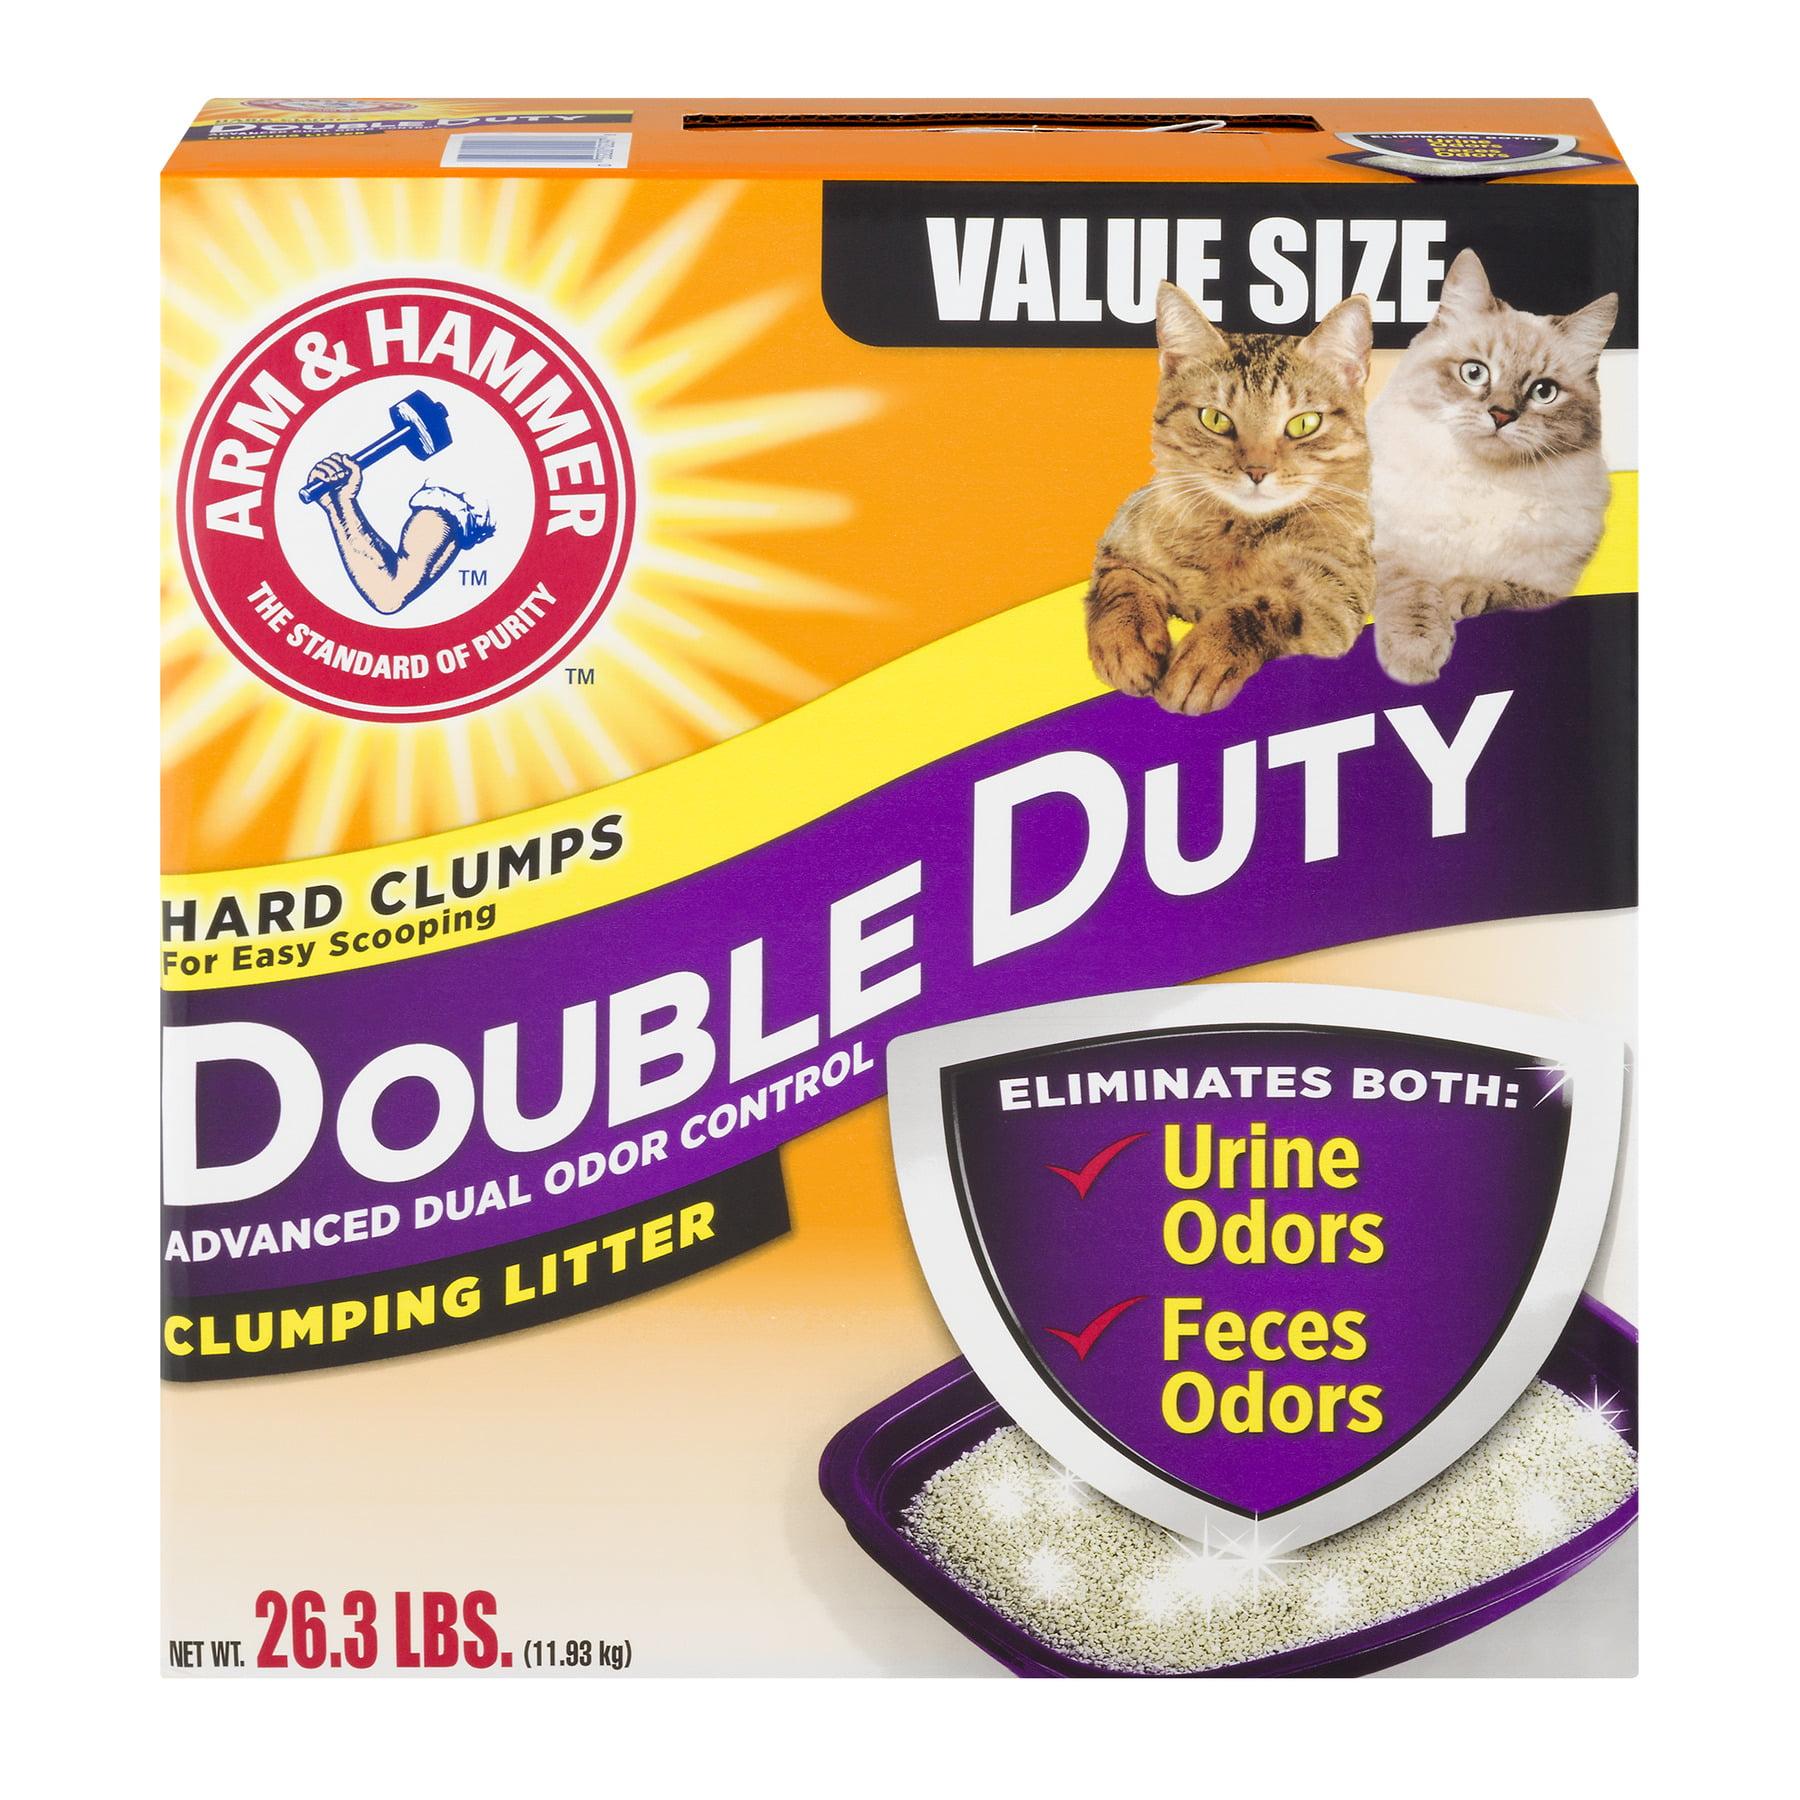 CHURCH & DWIGHT COMPANY 02297 26.3LB Double Duty Litter